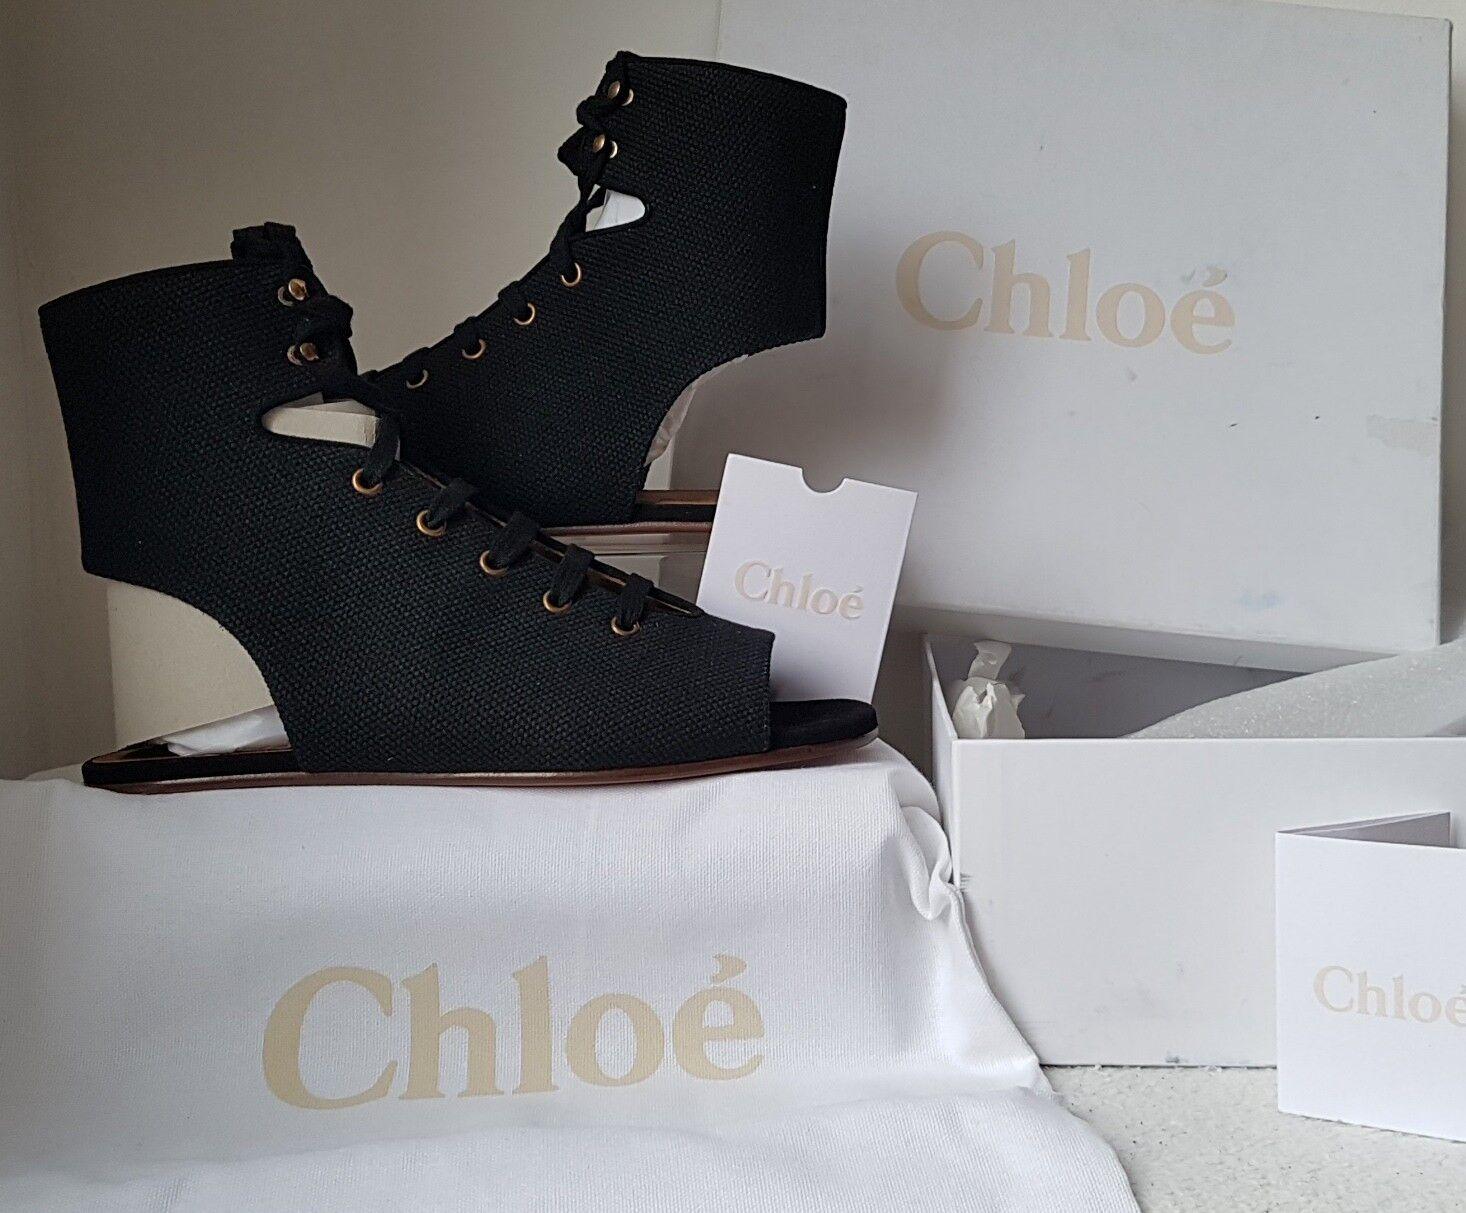 BNIB Black Chloe Canvas Lace Up Gladiator Sandals. UK Size 38.5 EU 38.5.  700